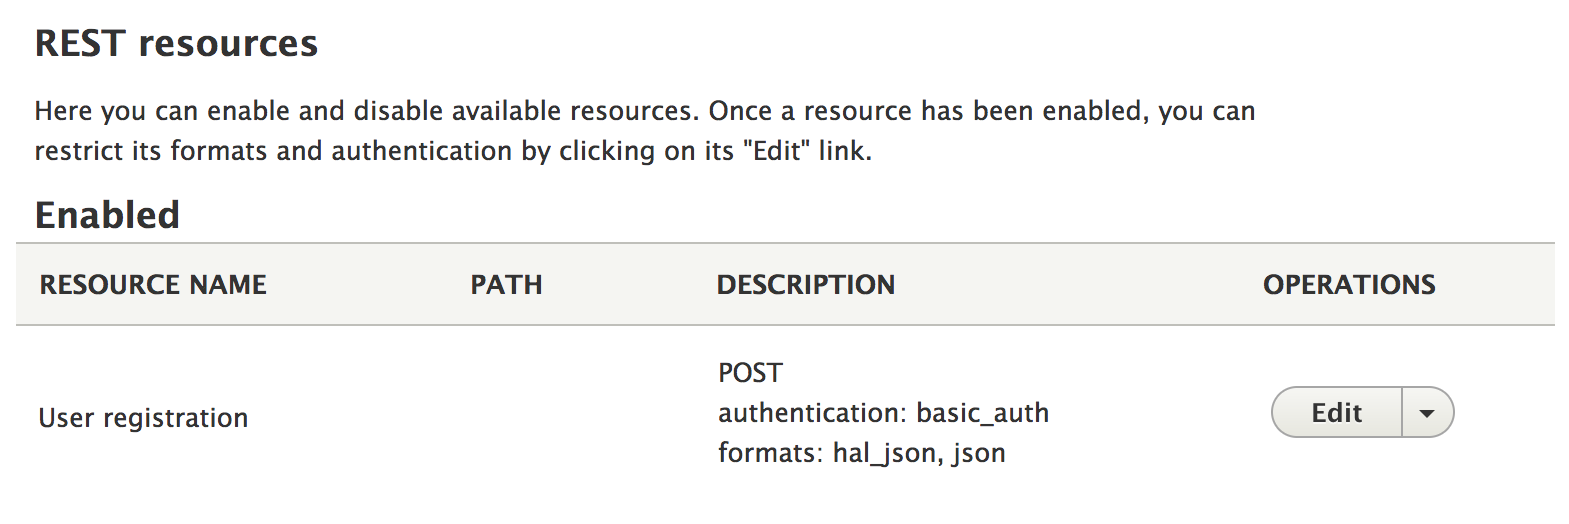 Register a User with Drupal 8 REST API   AreaType LLC